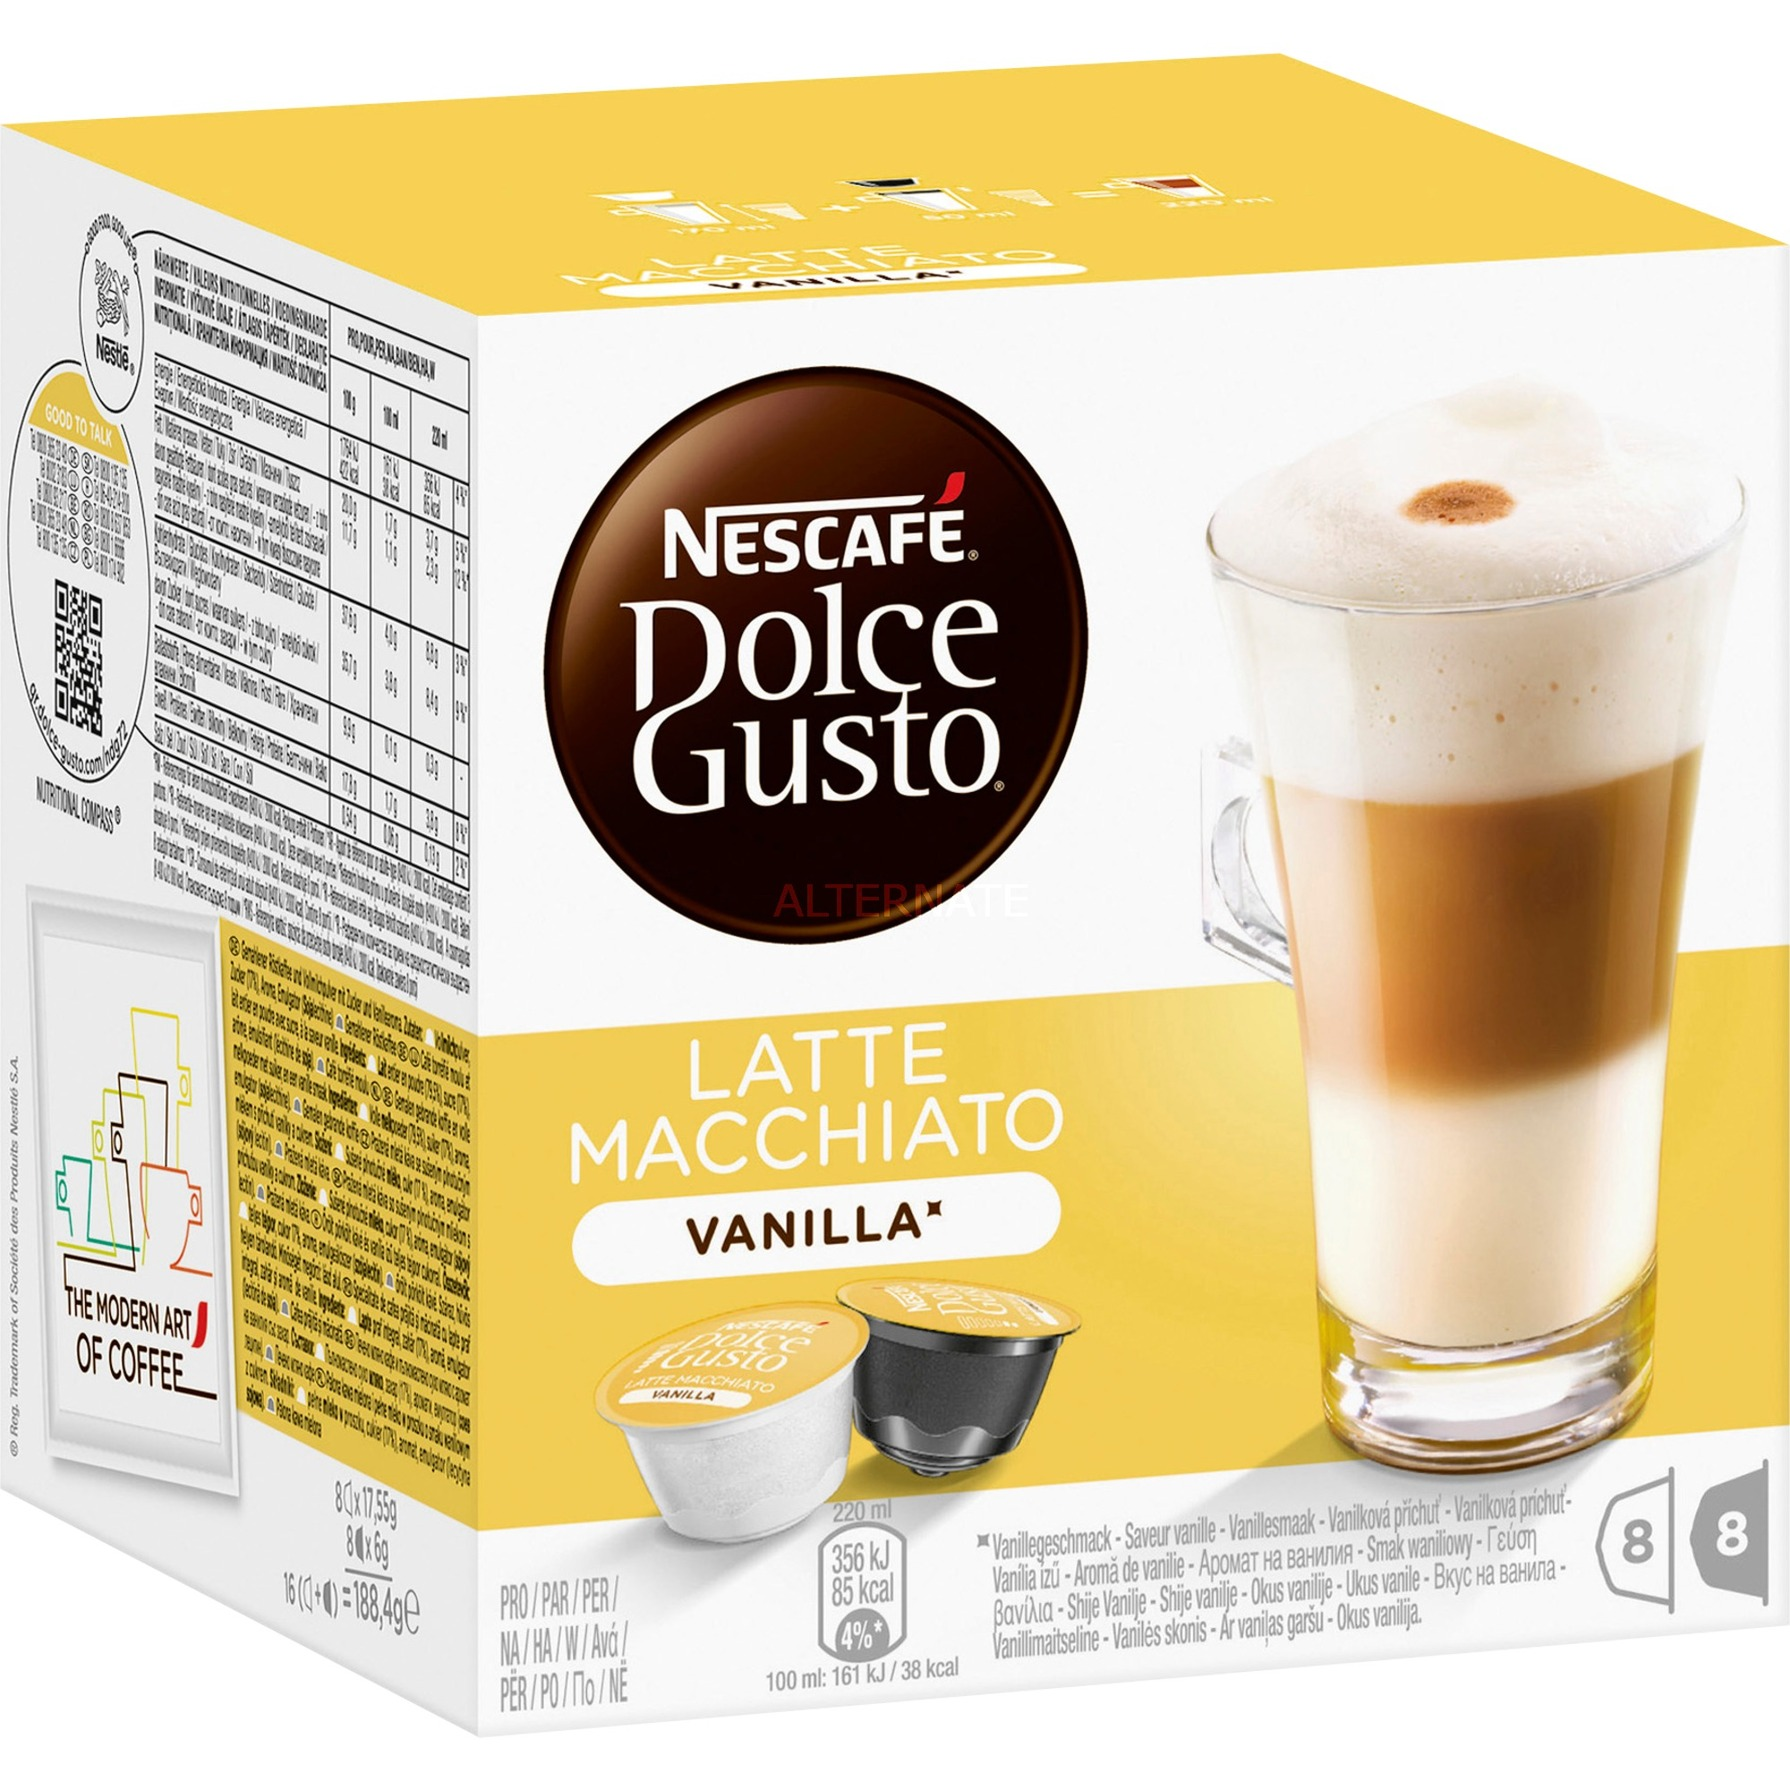 Dolce Gusto Latte Macchiato Vanilla café instantáneo, Cápsula de bebida